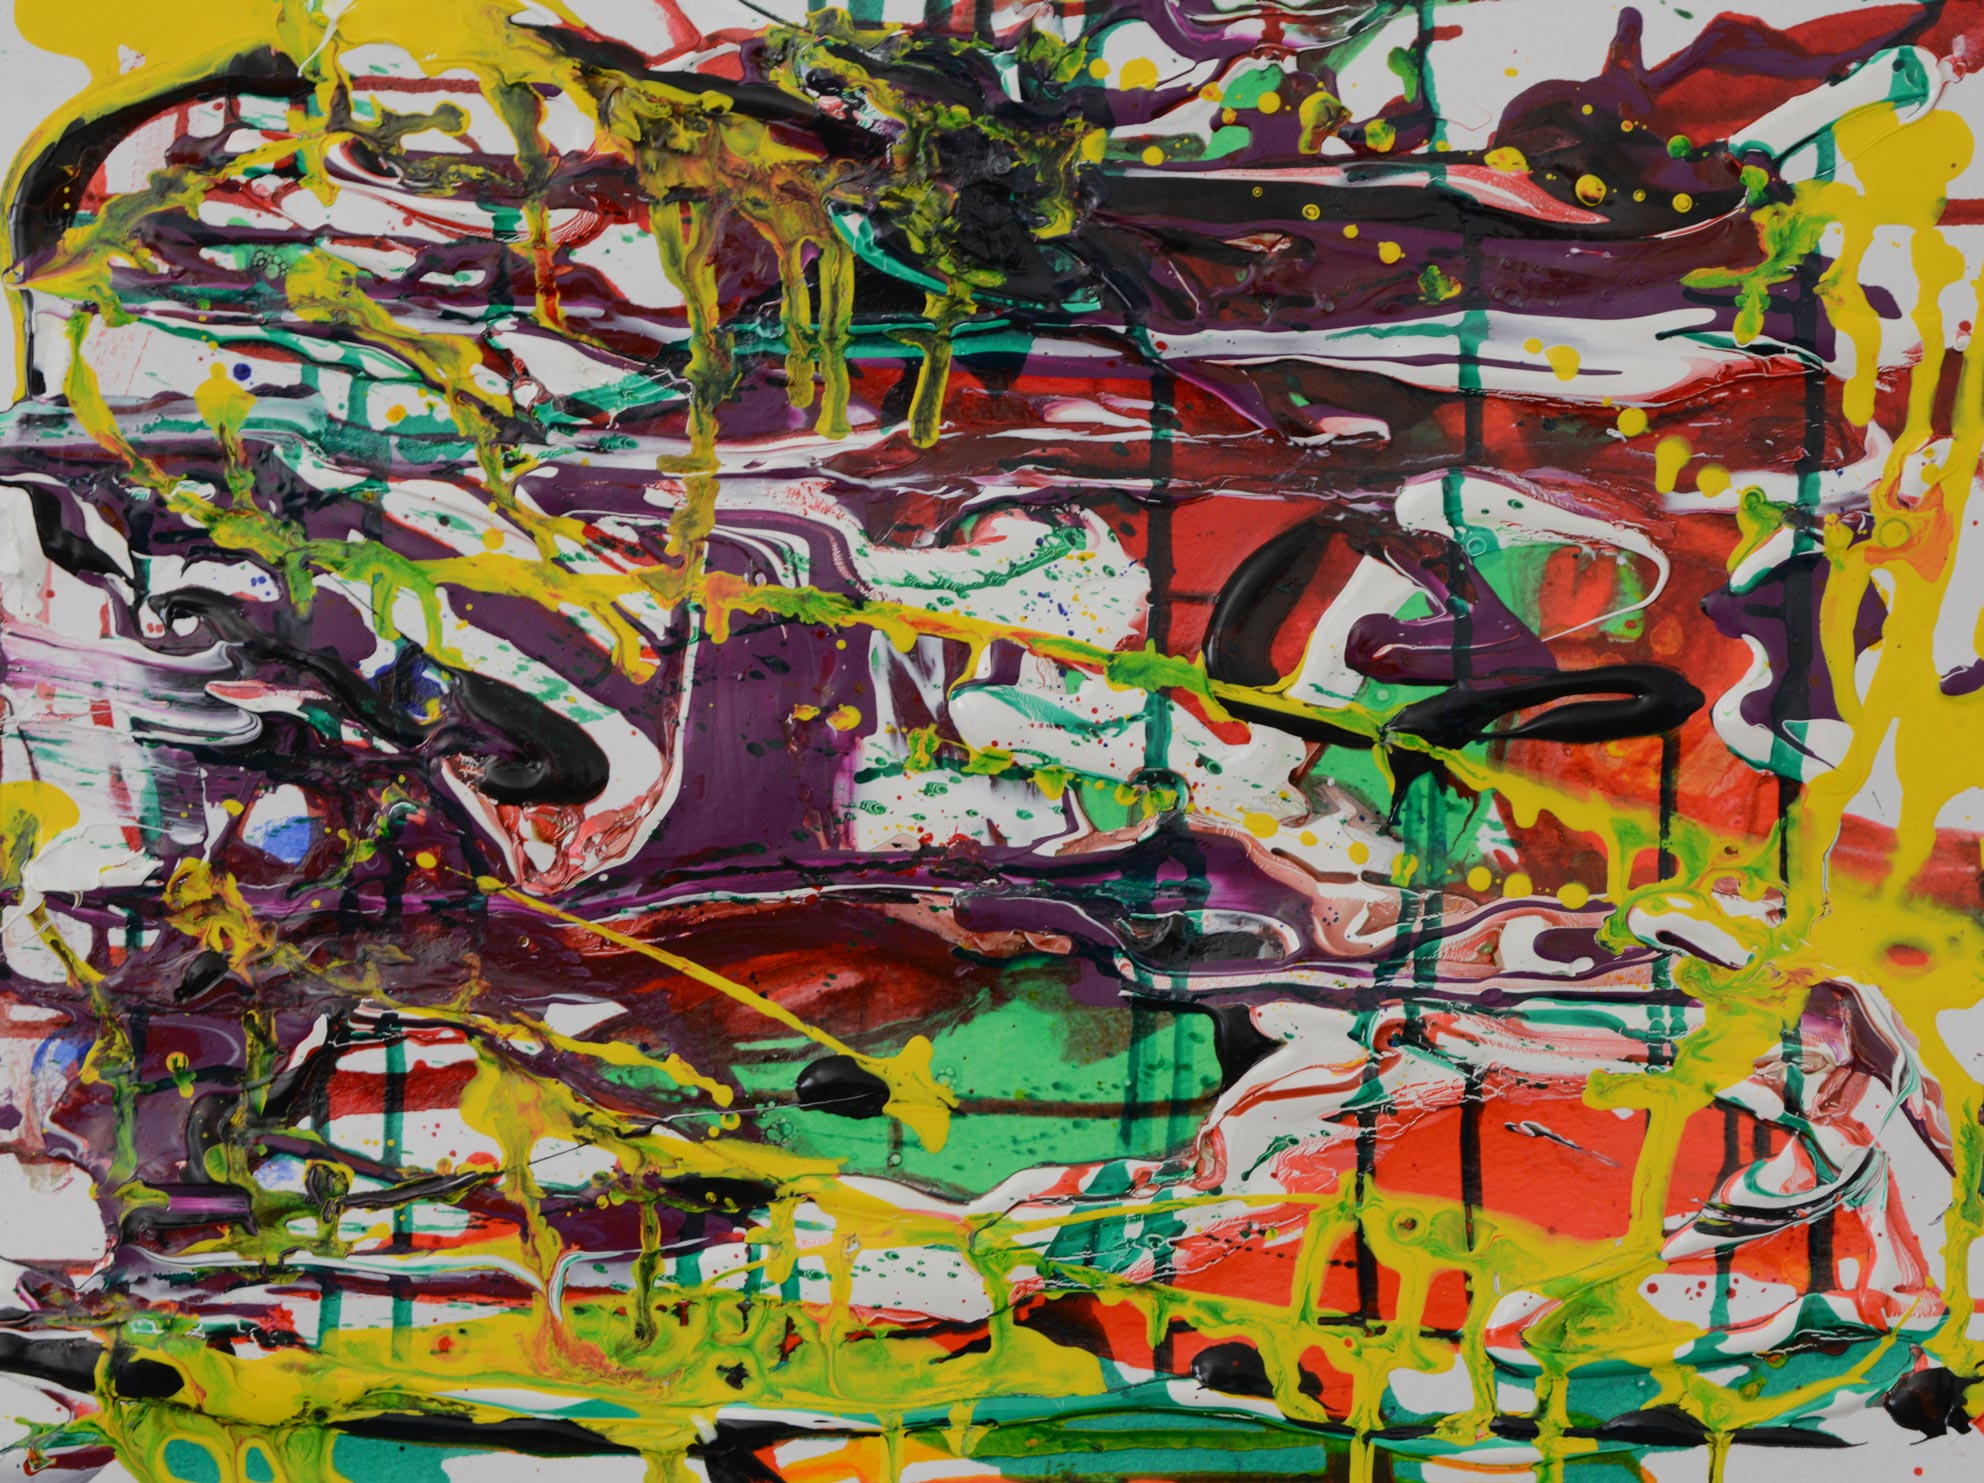 Abstrakte Komposition 5 | Acryl Aquarellfarben auf Papier